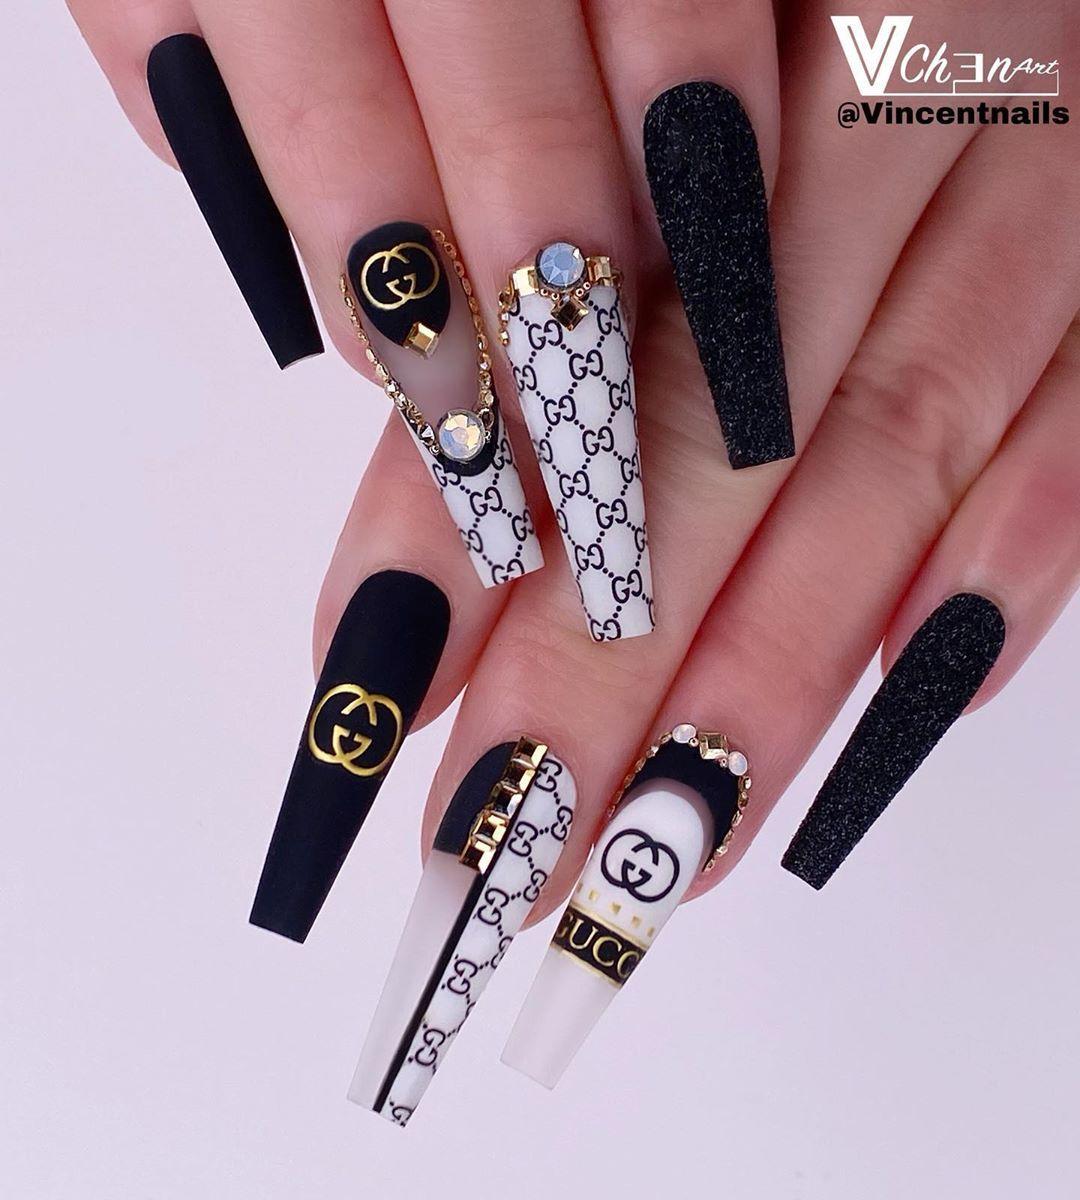 Vinchen Tran On Instagram Gucci Lover Nail Art Deco From Shopkeeki Vchenar In 2020 Gucci Nails Best Acrylic Nails Glow Nails